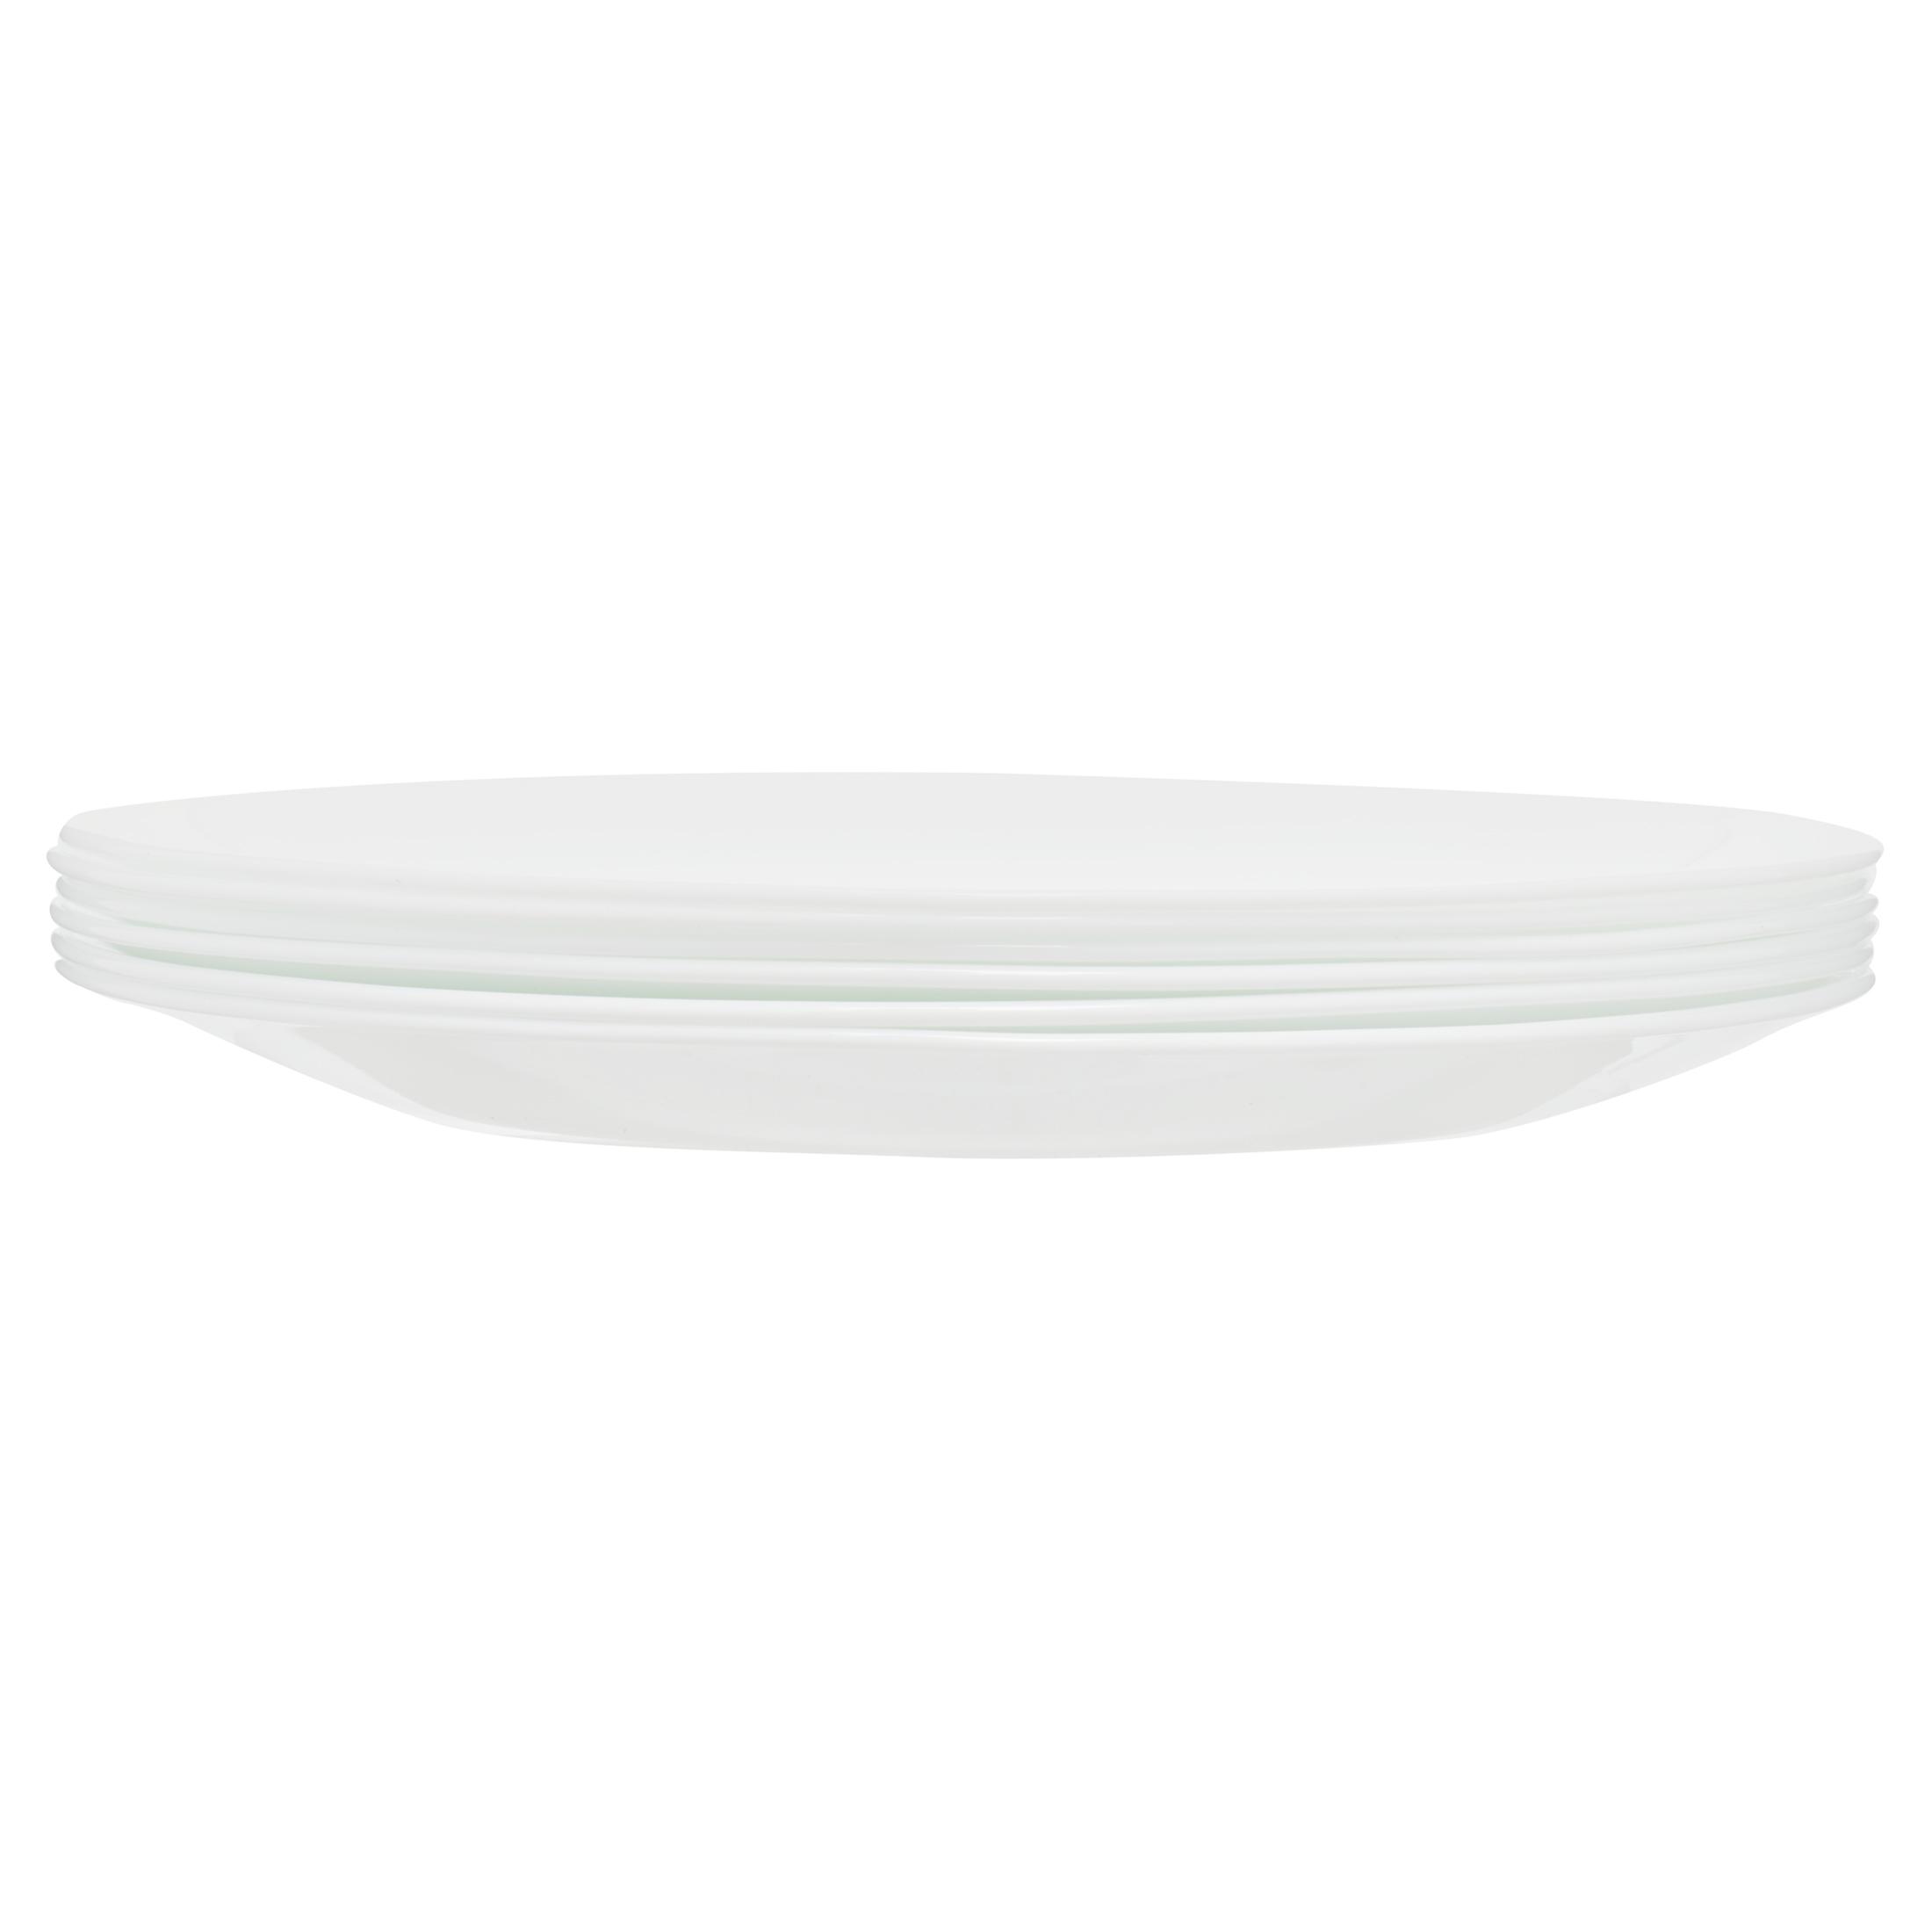 Corelle Classic Winter Frost White 10 25 Dinner Plate Set Of 6 Walmart Com Walmart Com